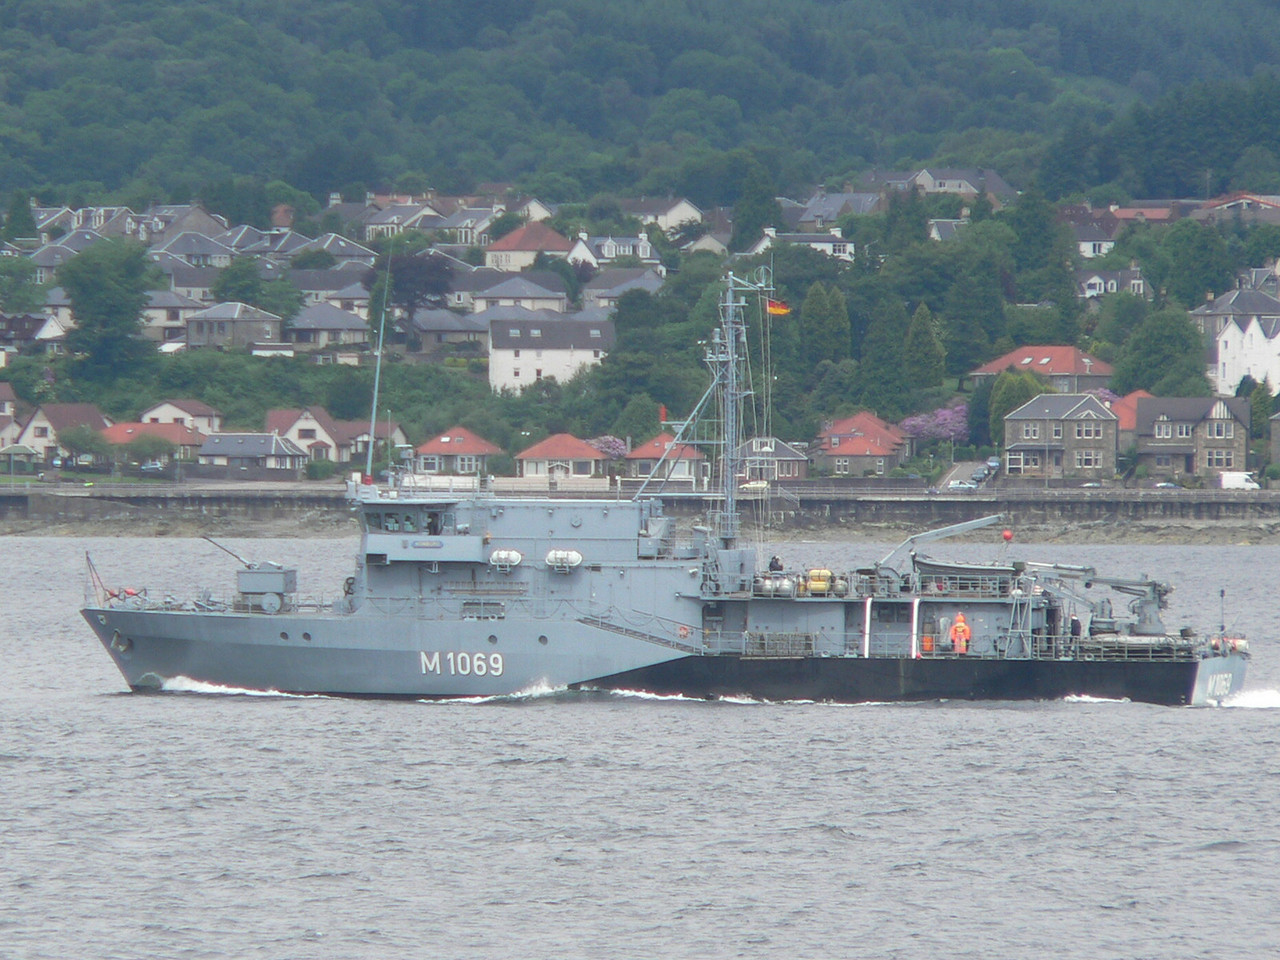 M-1069 FGS HOMBURG